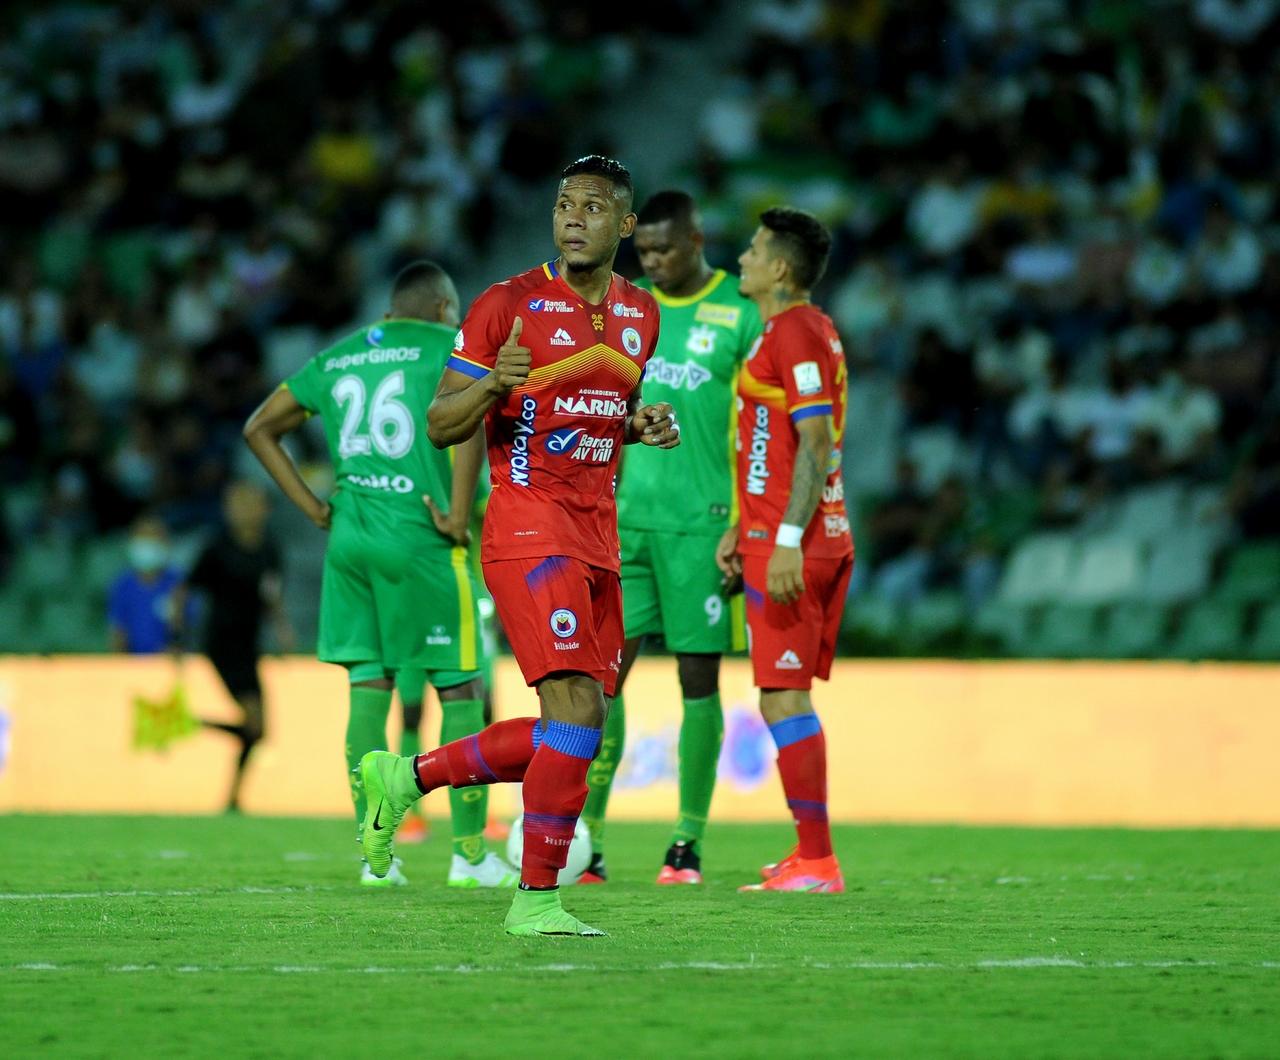 Deportes Quindio vs Deportivo Pasto 1